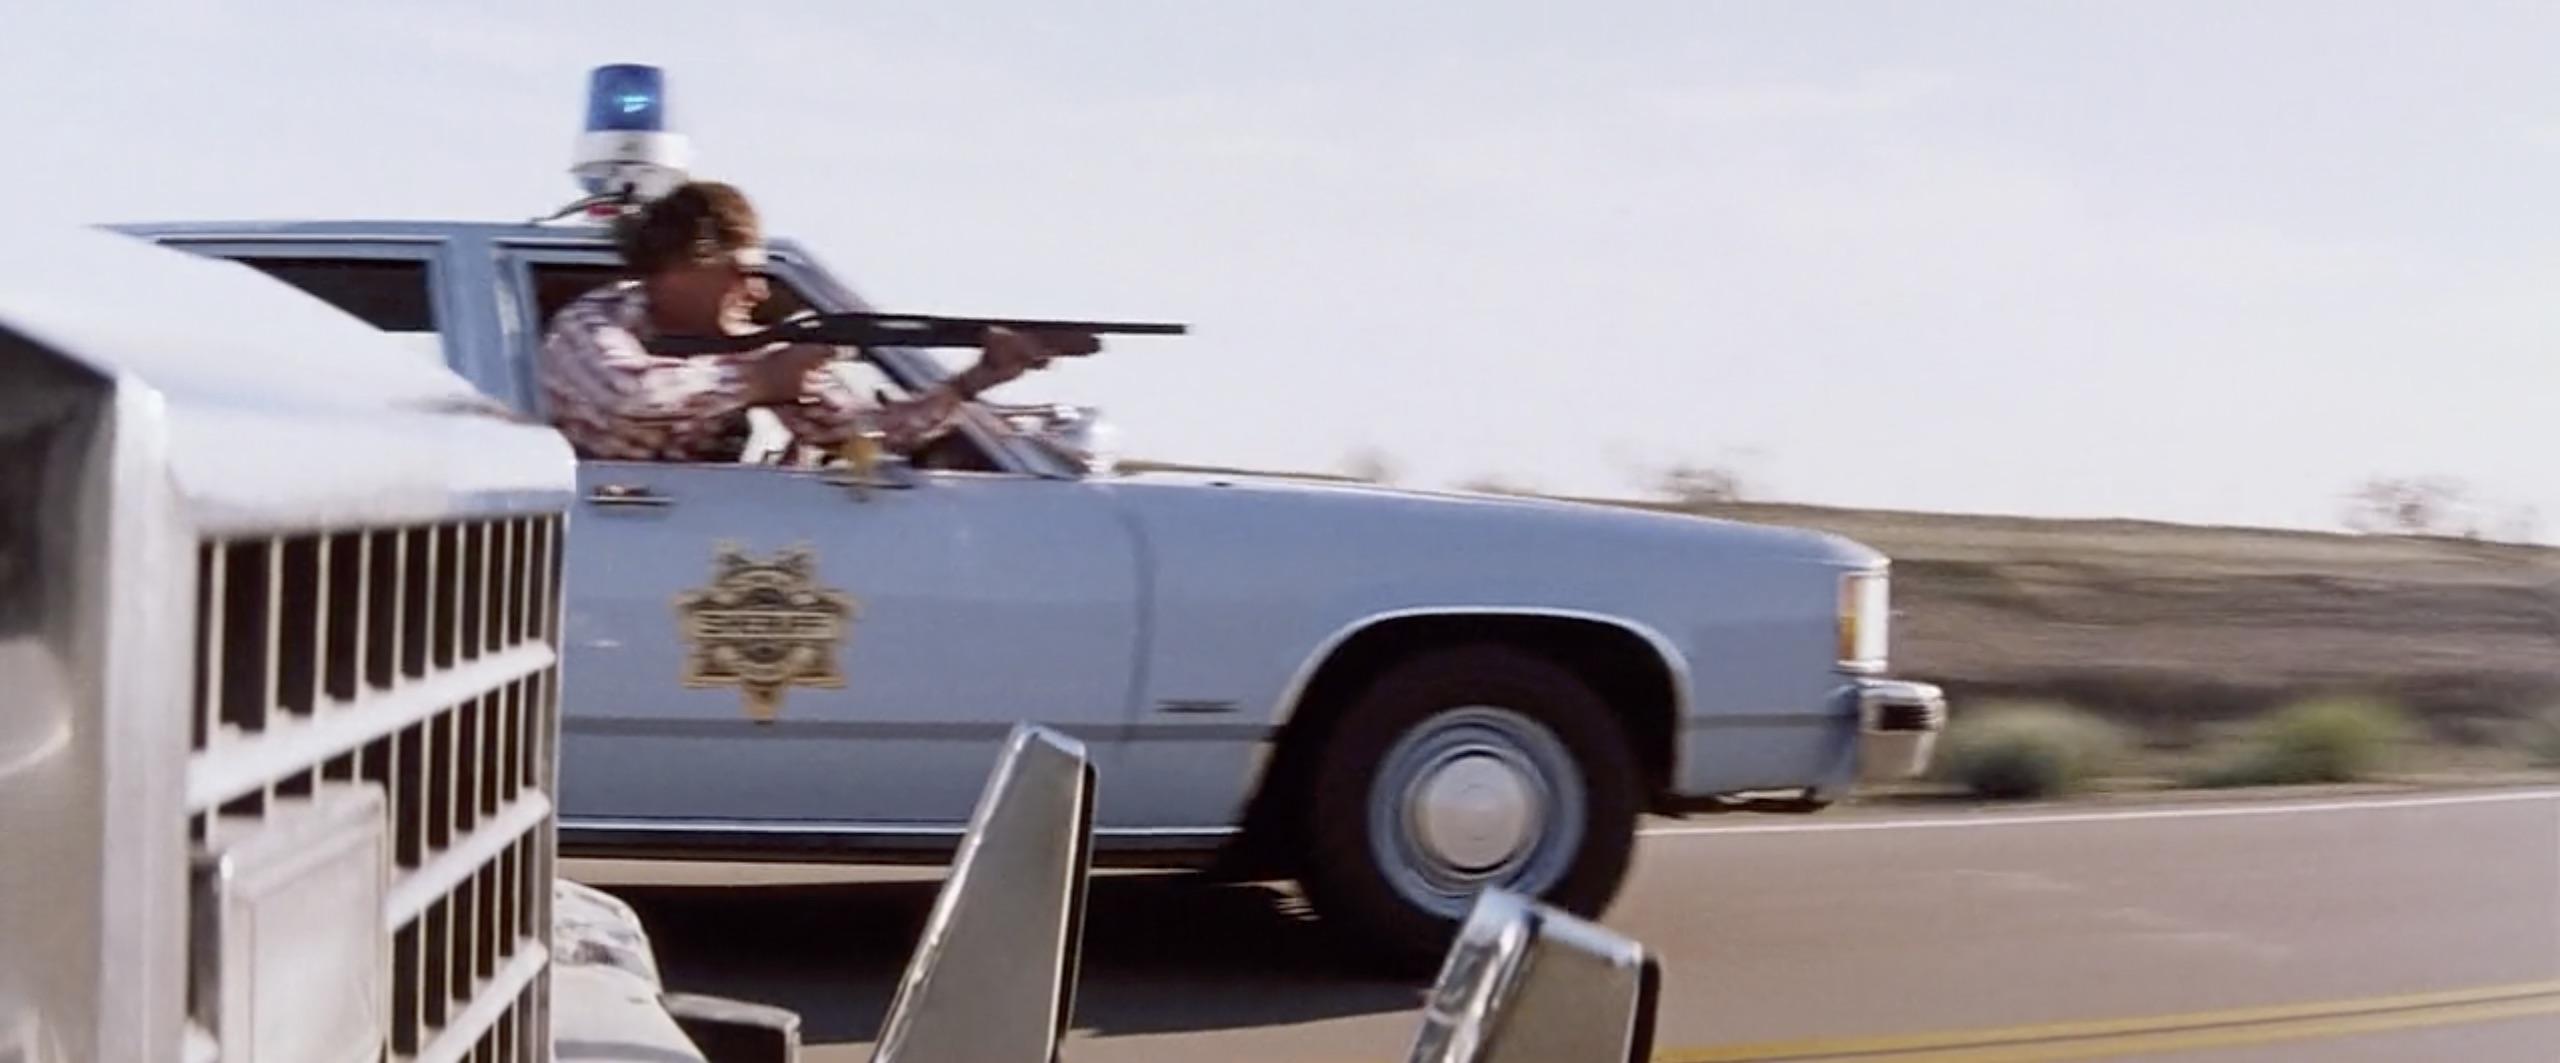 Hitcher cop shotgun in car chase